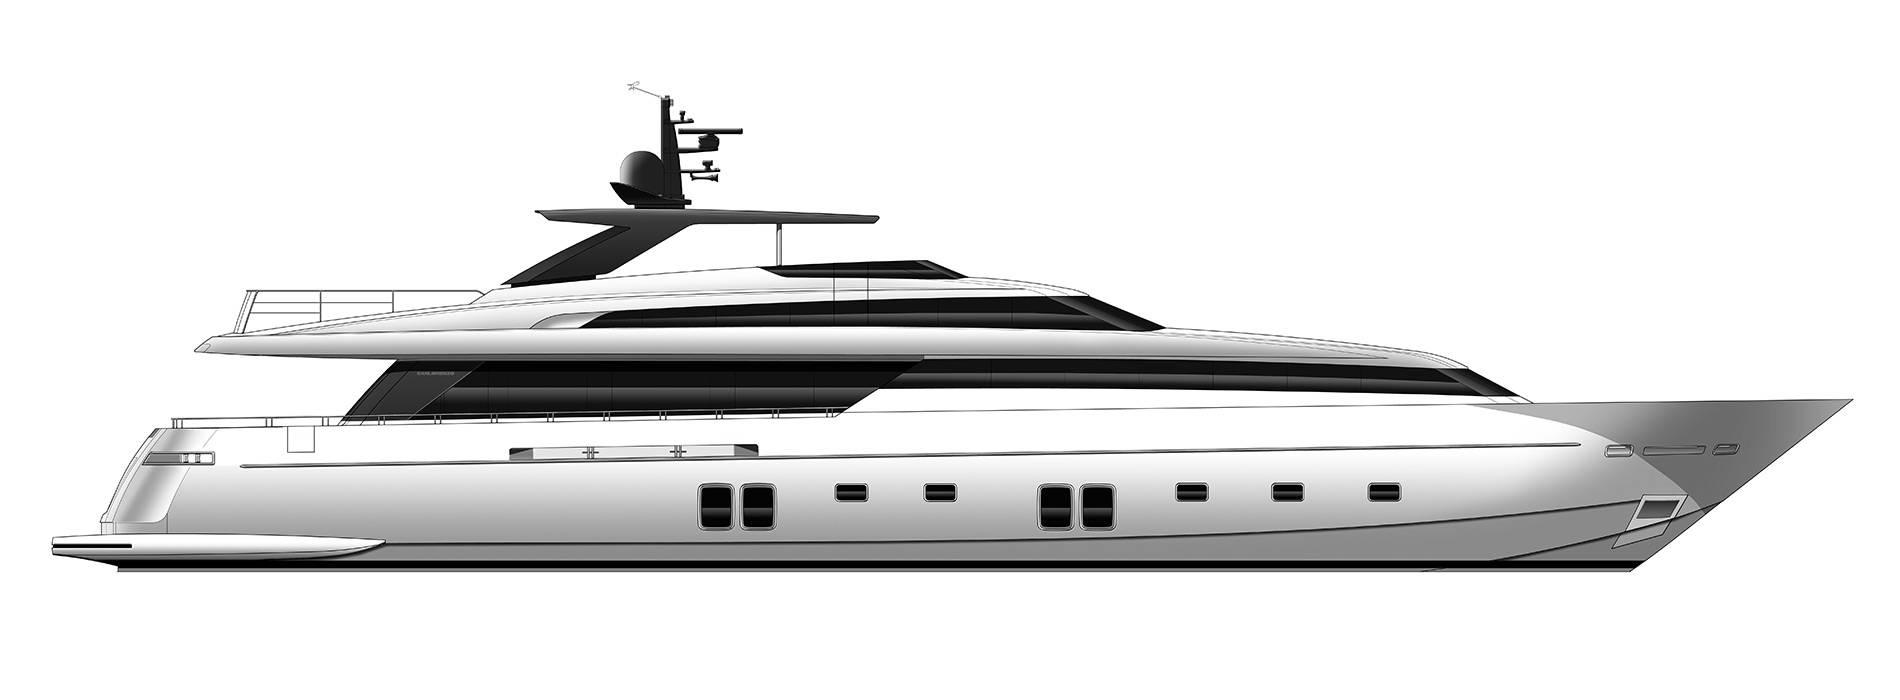 Sanlorenzo Yachts SL118 Profile